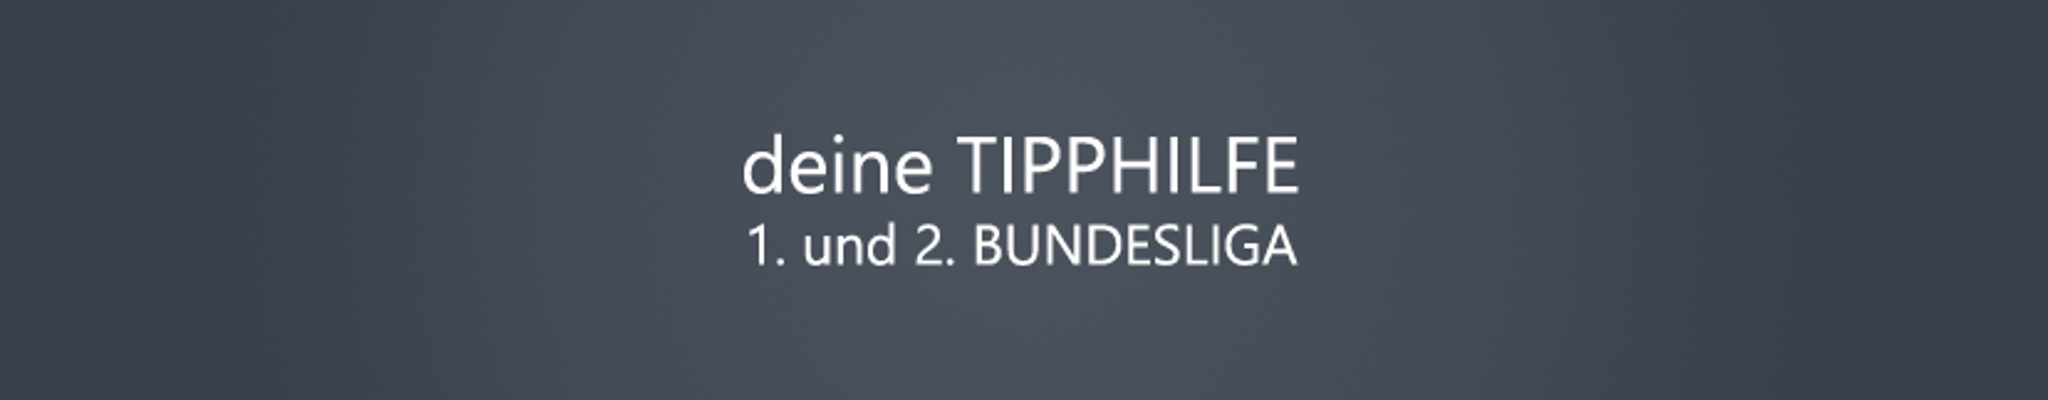 Bundesligatipphilfe